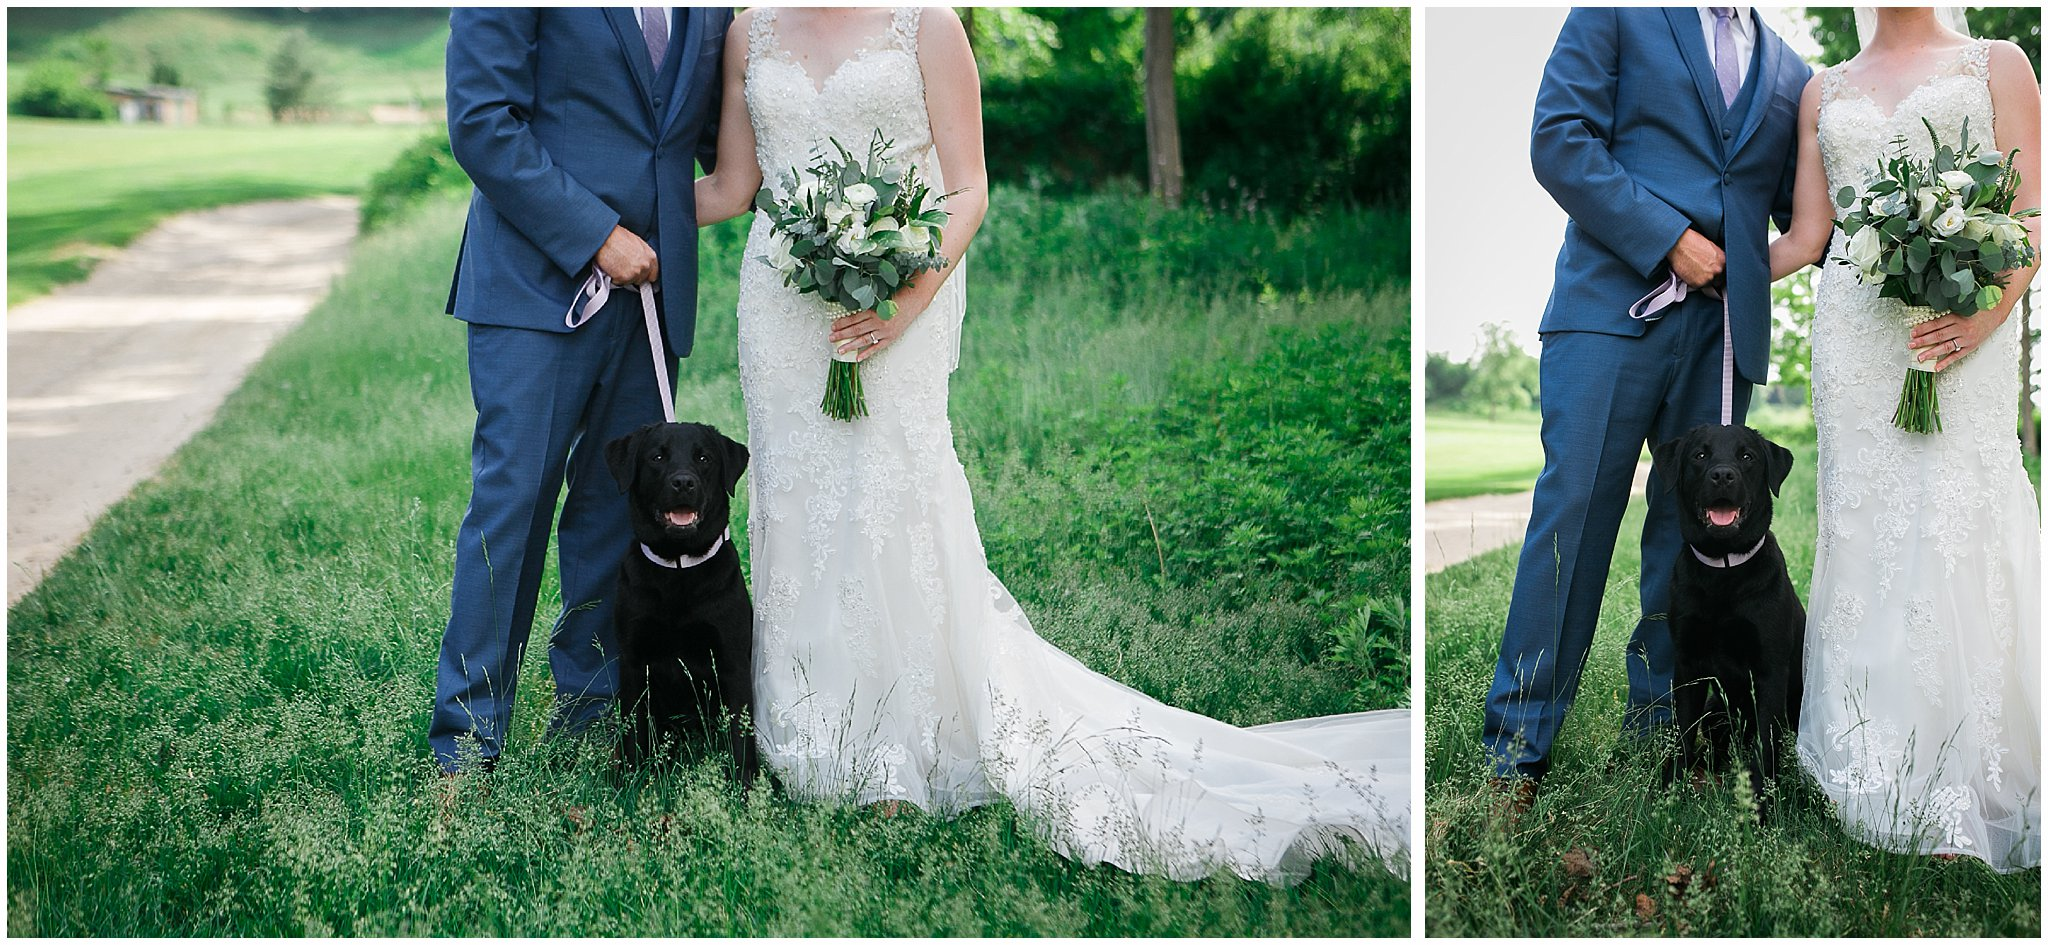 Hollow Brook Golf Club Cortlandt Manor NY Wedding Sweet Alice Photography June Wedding51.jpg